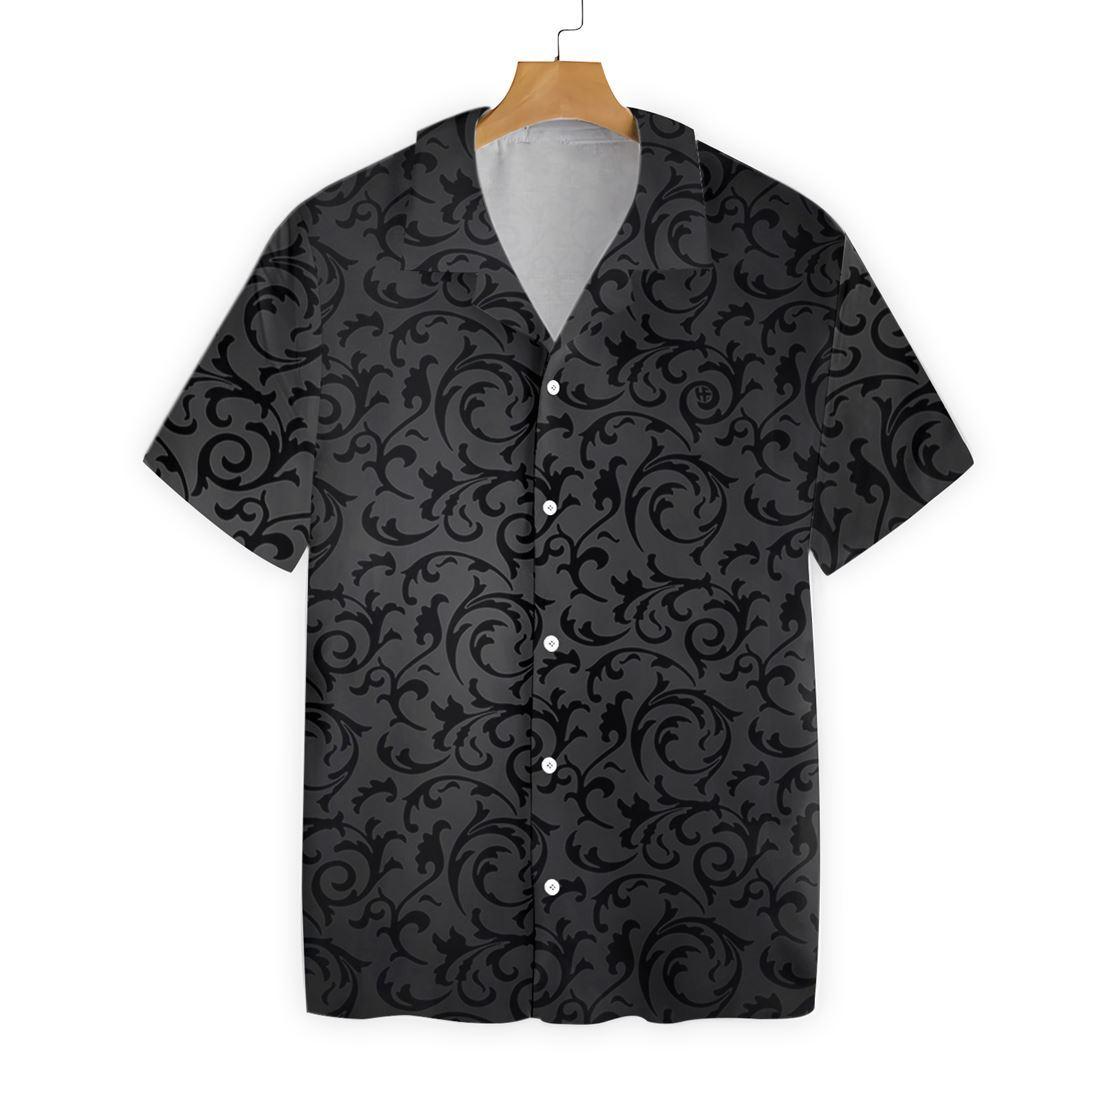 Black And Grey Seamless Floral Goth Style Hawaiian Shirt